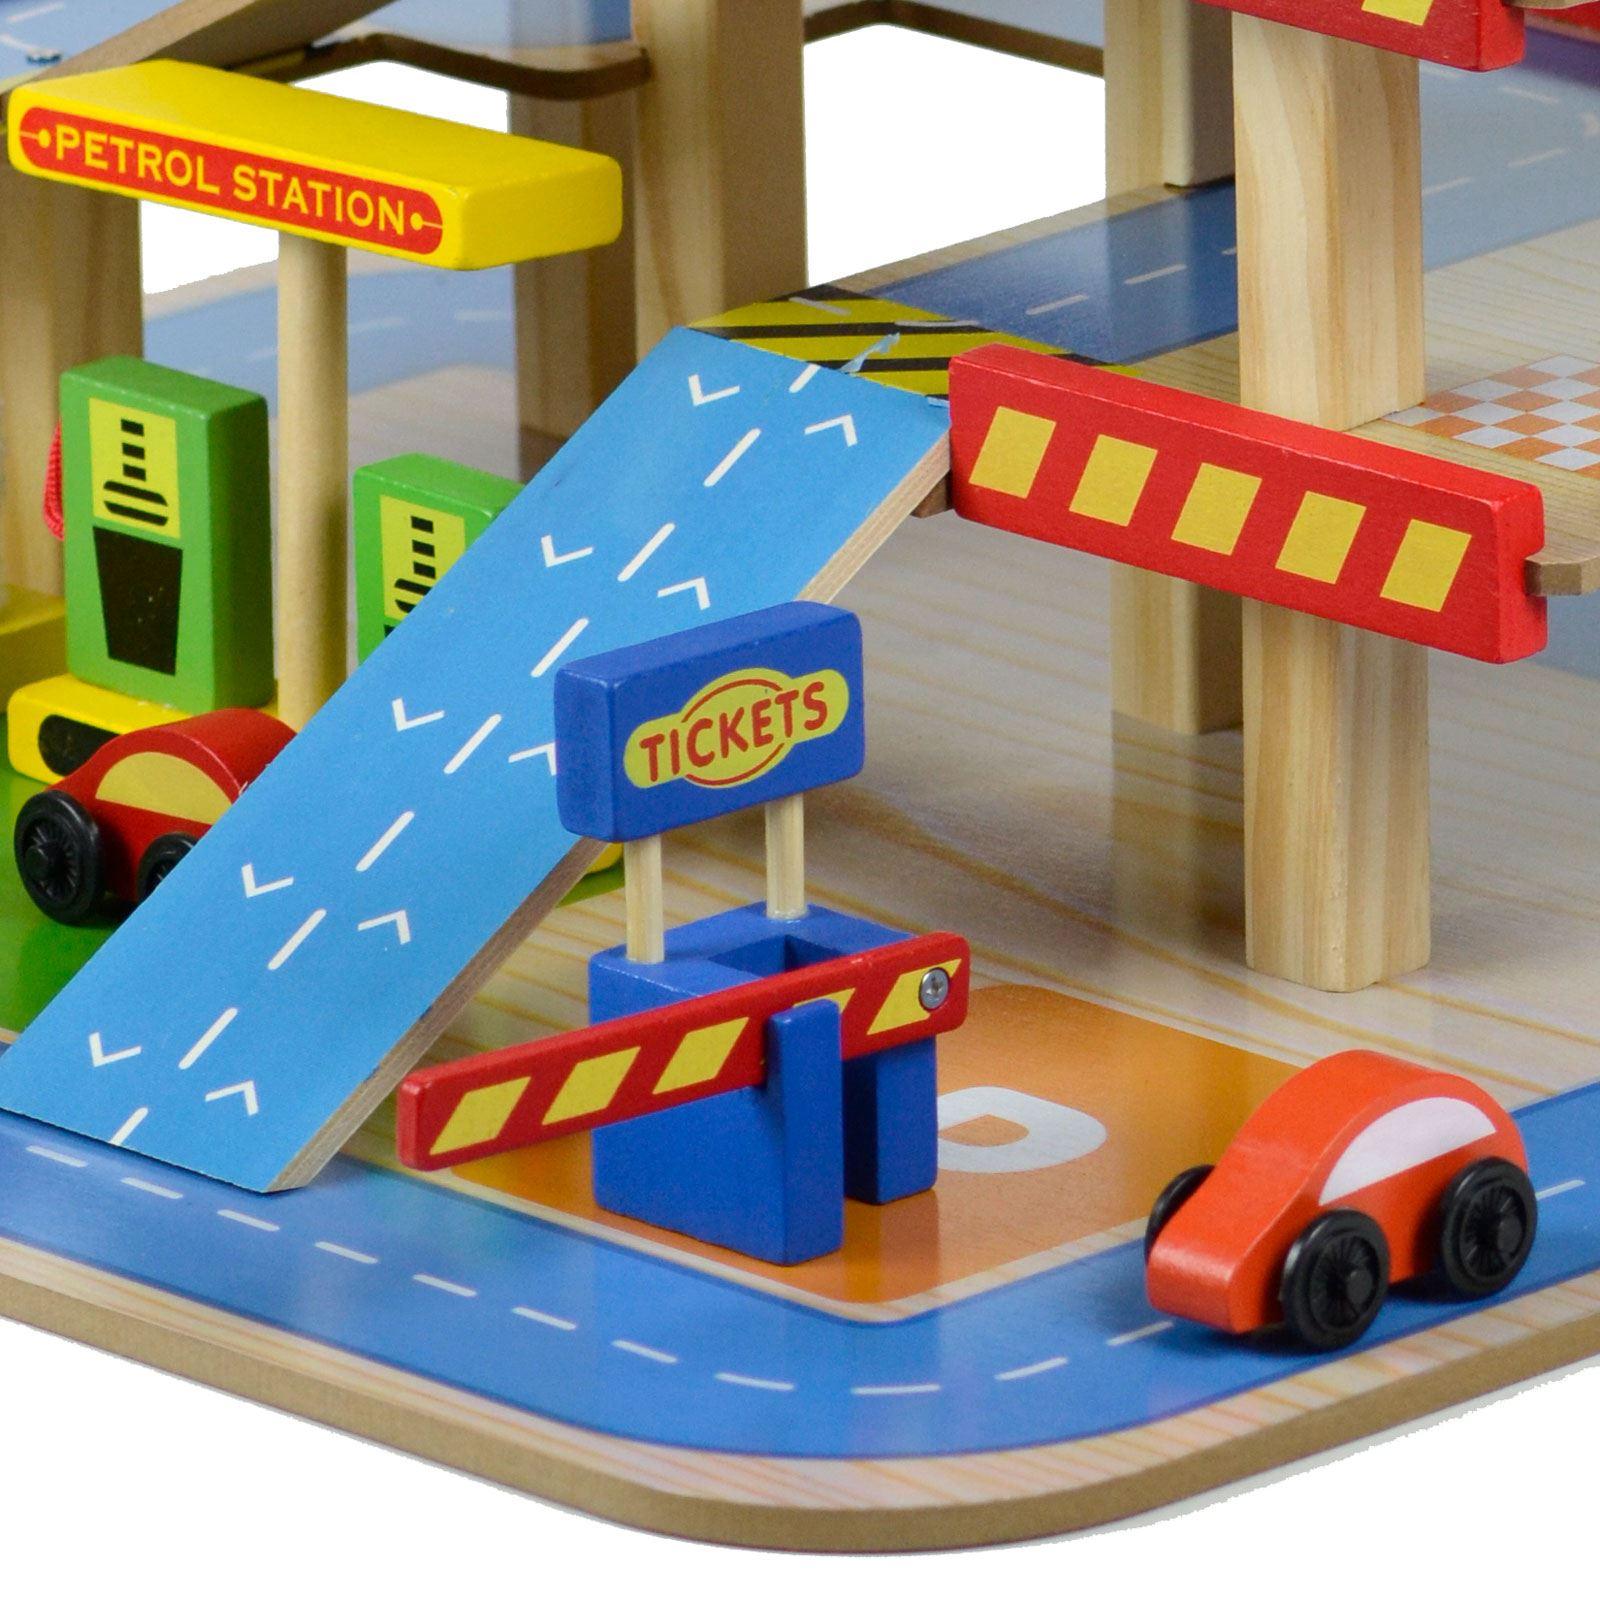 Wooden Multi Storey Car Park Petrol Garage Gas Station